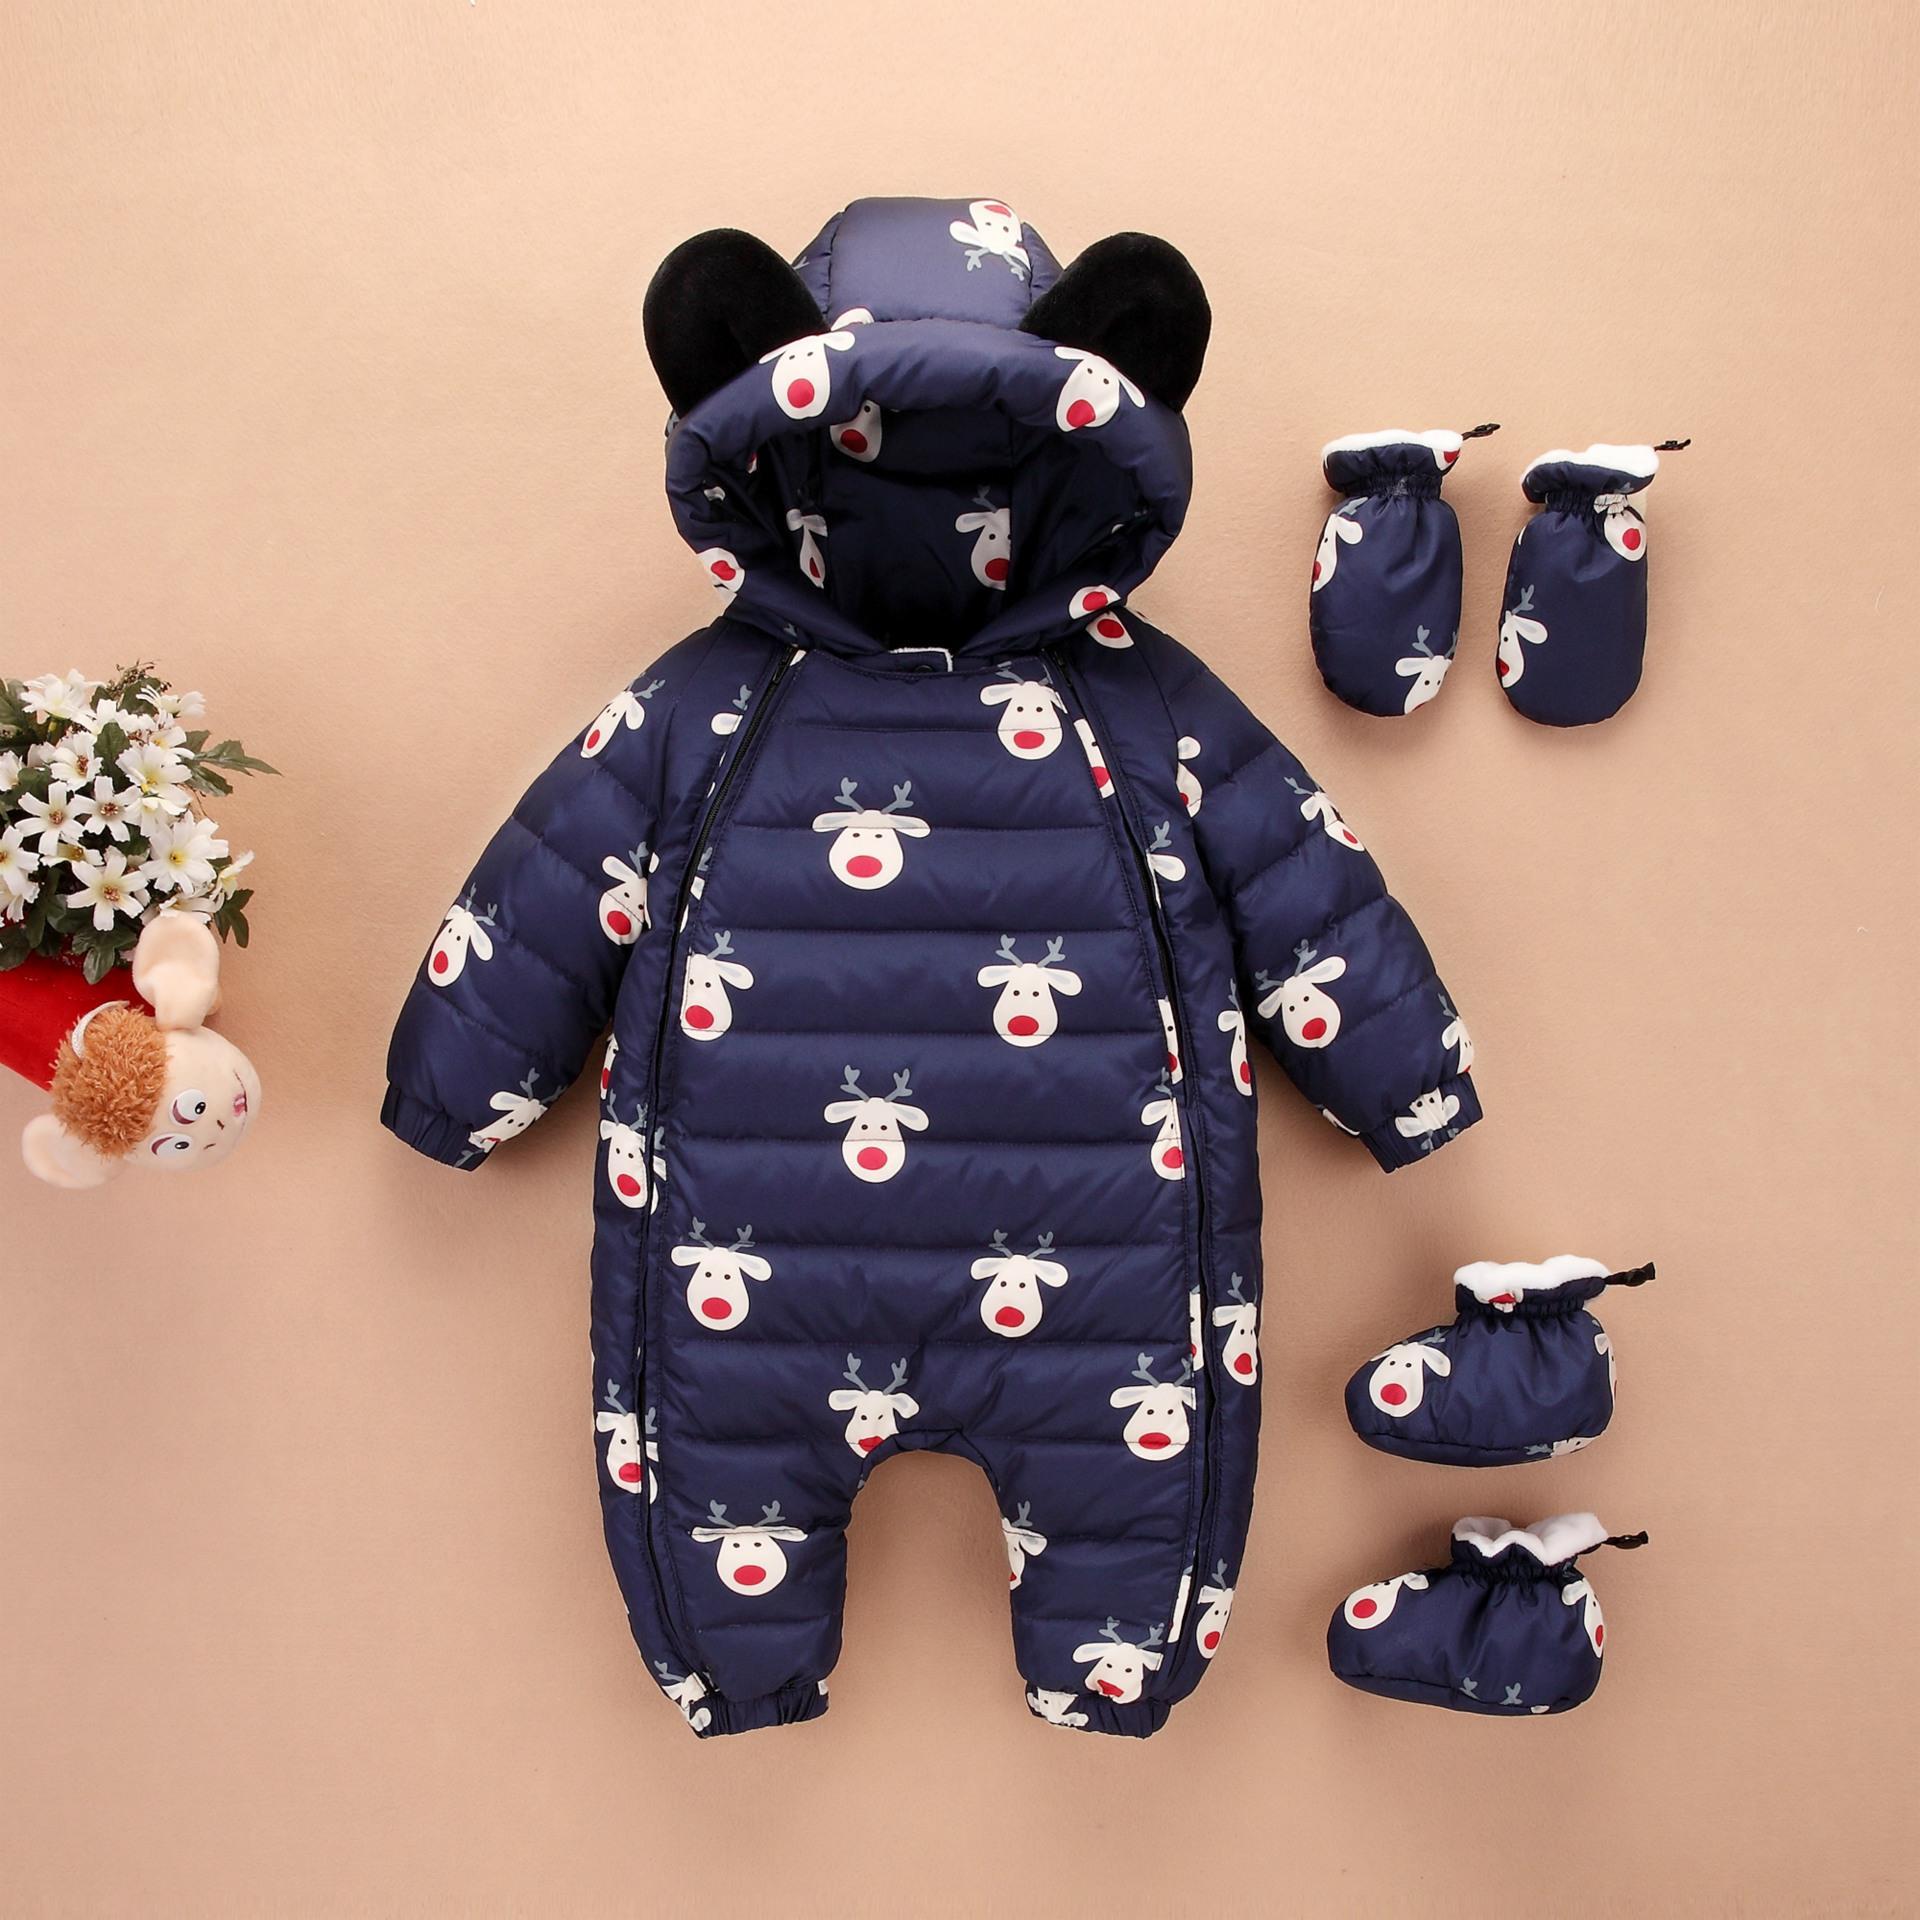 OLEKID 2021 Plus Velvet Baby Winter Snowsuit Hooded Catoon Bear Newborn Rompers Tollder Girls Down Overalls Infant Boys Jumpsuit